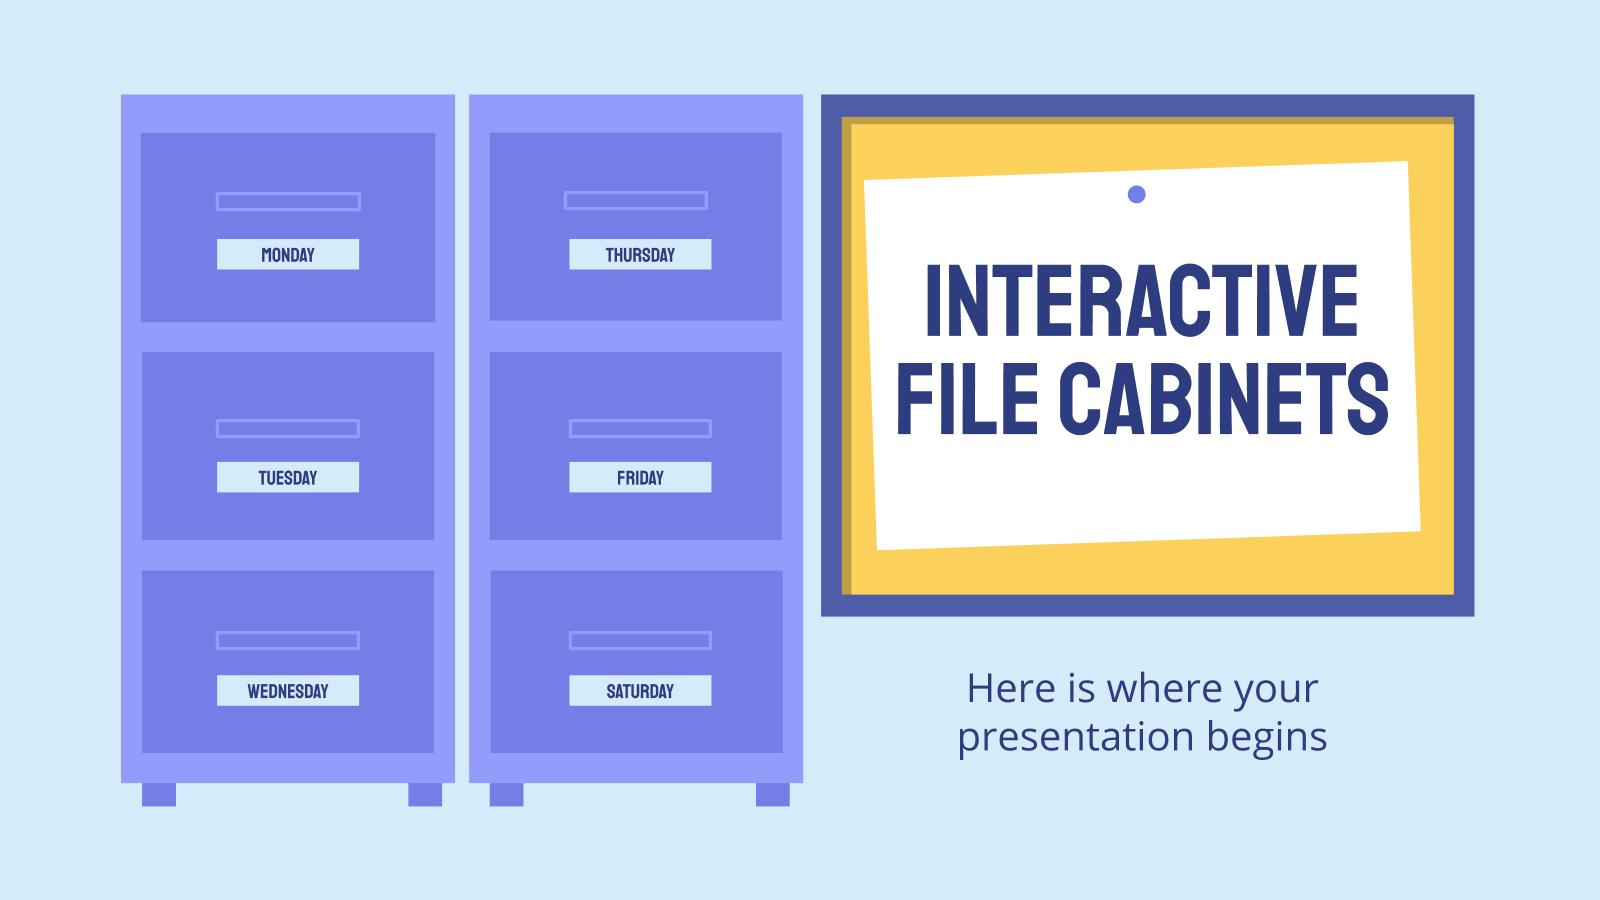 Interactive File Cabinets presentation template